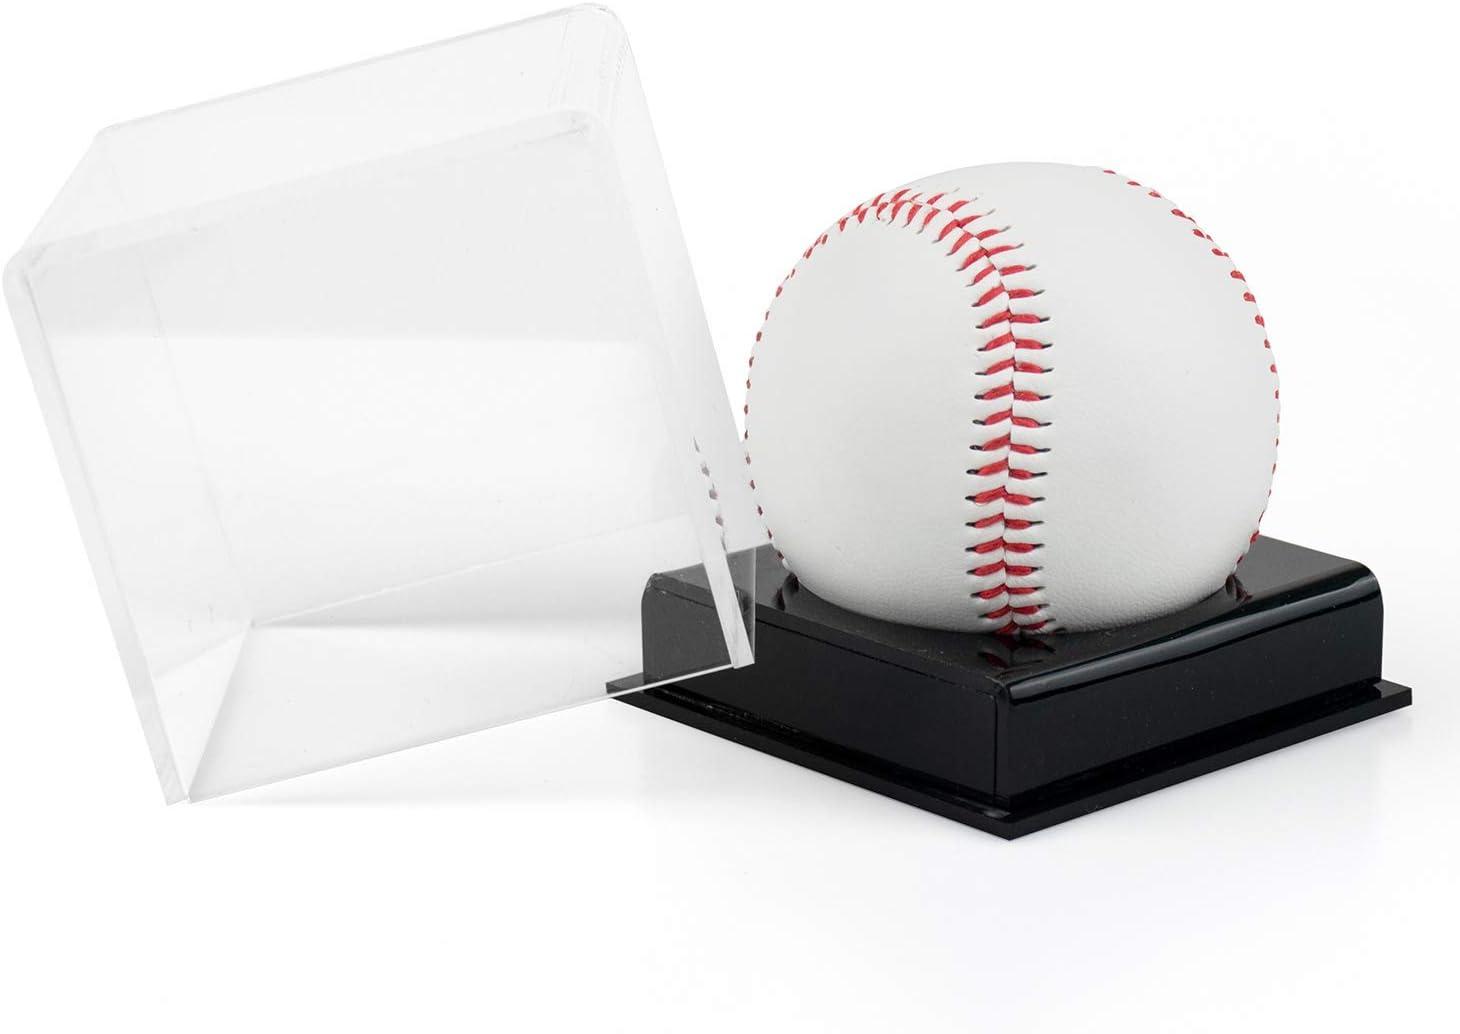 Tebery 4 Pack Acrylic Baseball Display Case Square Clear Baseball Display Box Cube Baseball Holder